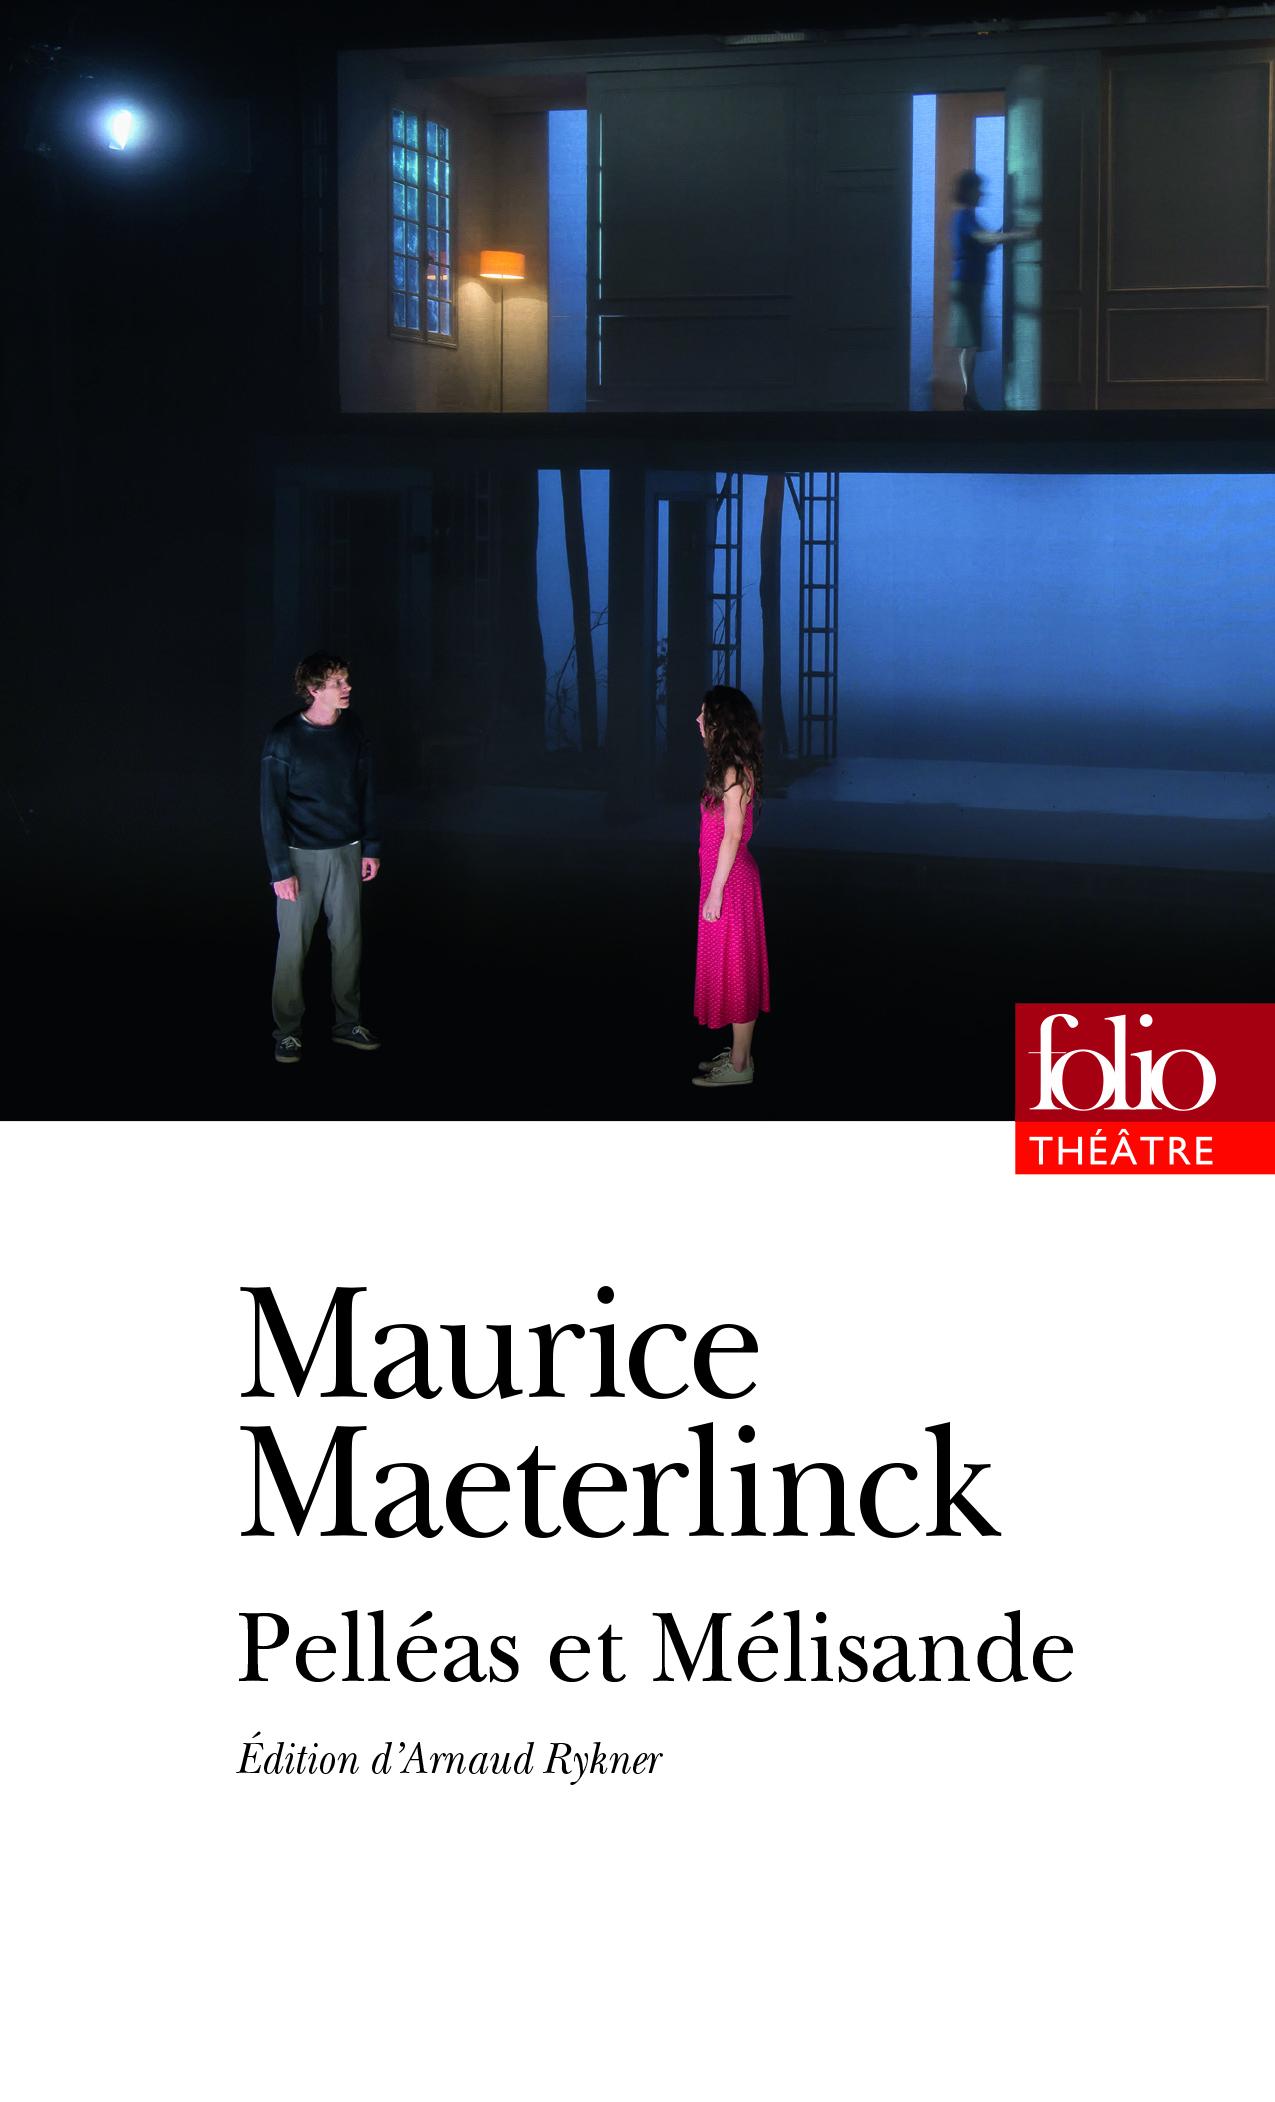 M. Maeterlinck, Pelleas et Mélisande (éd. A. Rykner, Folio Théâtre)